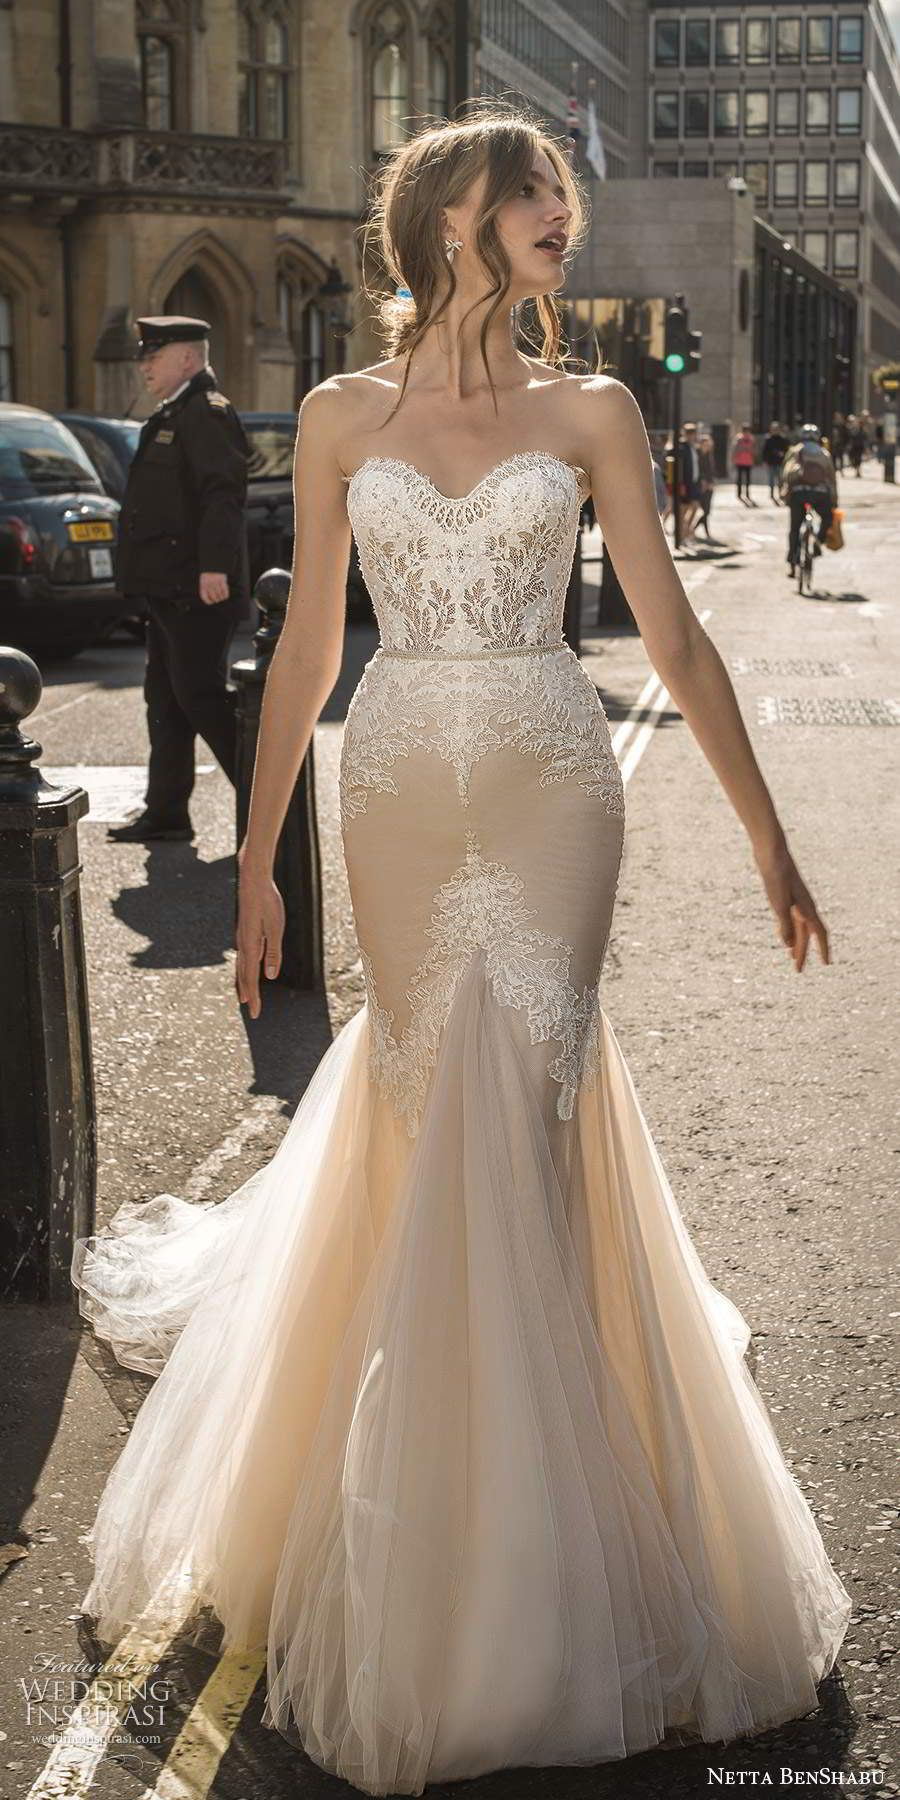 Netta Benshabu Fall 2020 Wedding Dresses Amour Bridal Collection Wedding Inspirasi Wedding Dresses Wedding Dresses Lace Modest Wedding Dresses [ 1800 x 900 Pixel ]